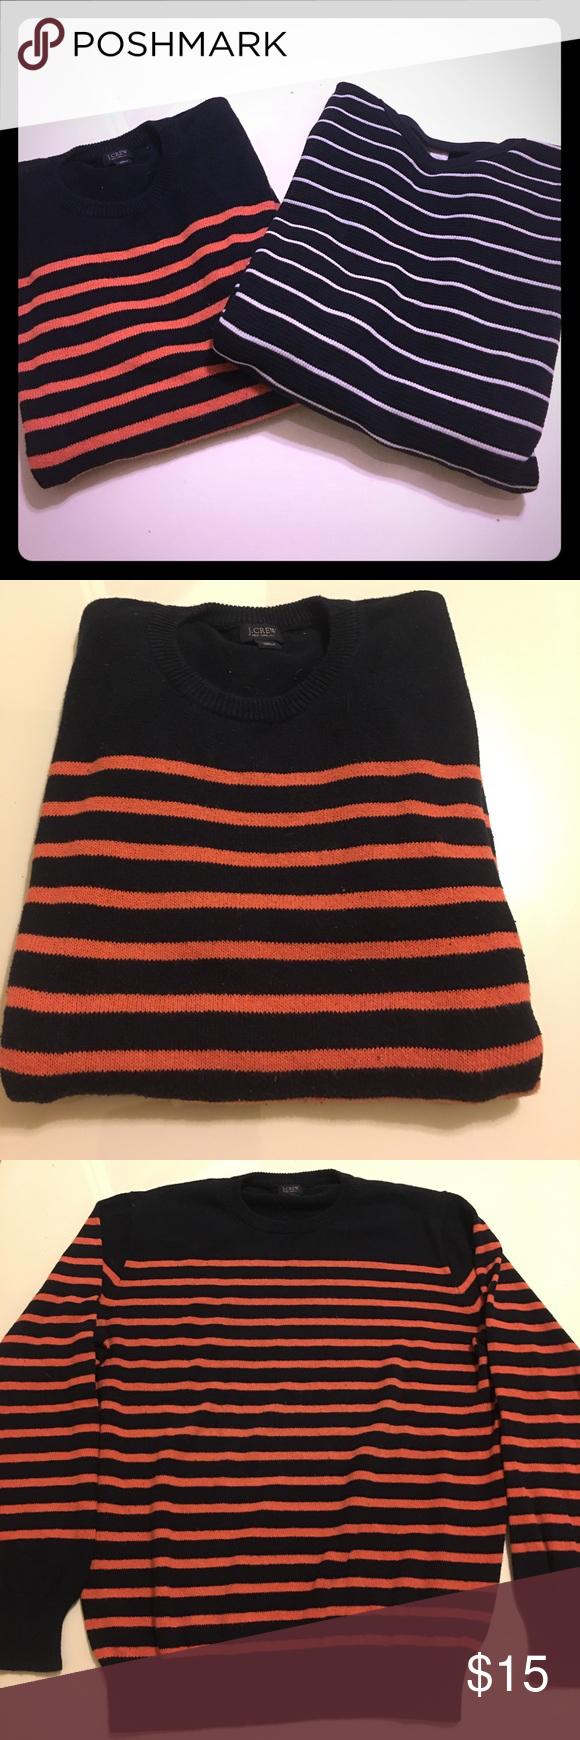 Bundle of J.Crew Men's Striped Sweaters Medium | Navy stripes